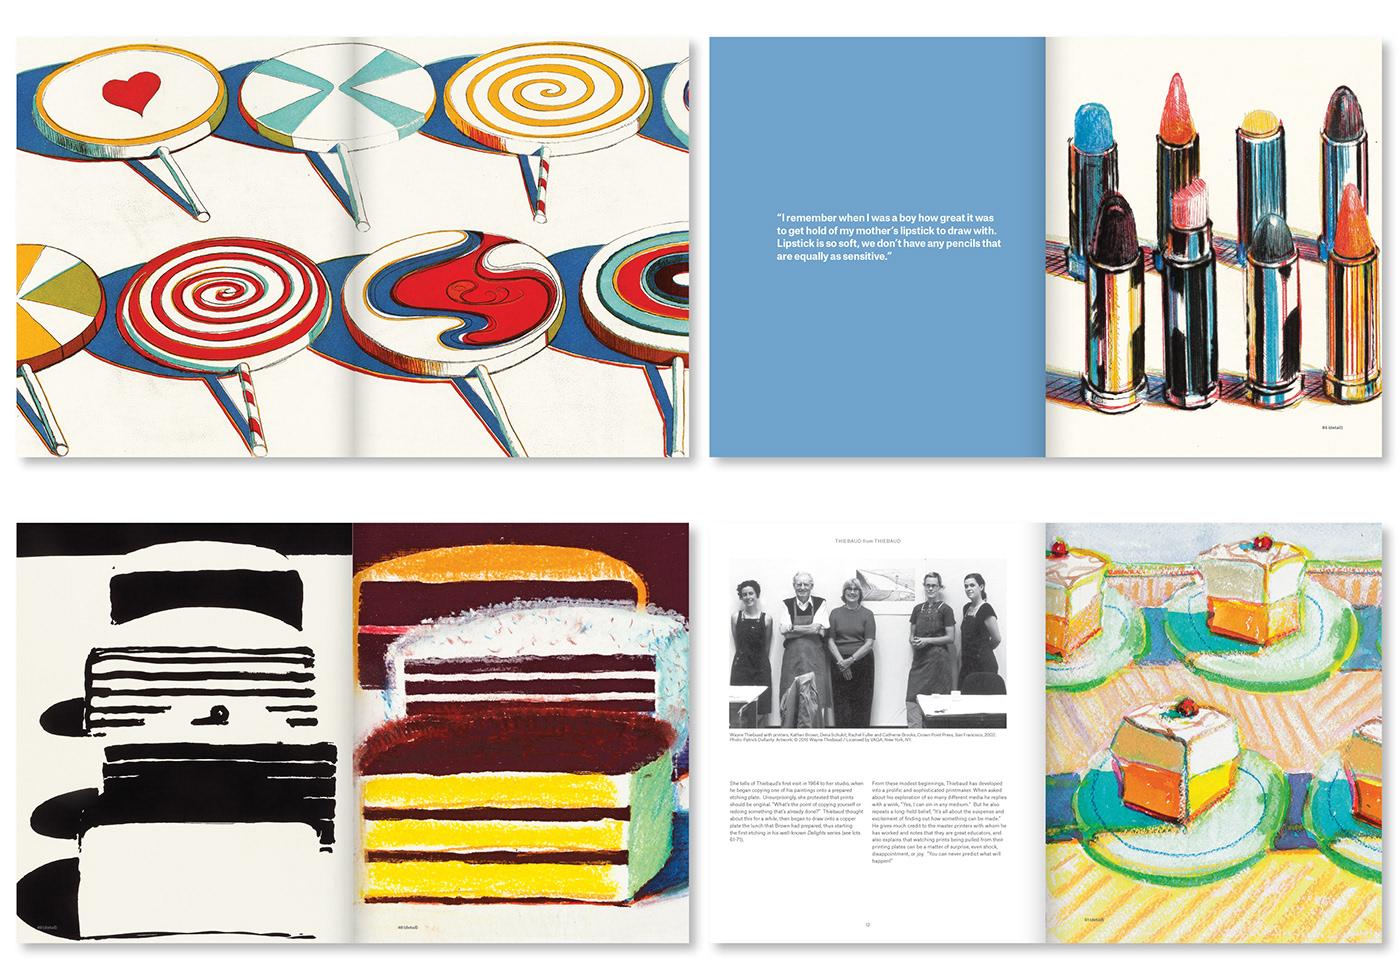 fine art catalogue auction catalogue  book design Wayne Thiebaud branding  Creative Direction  redesign typeography print design